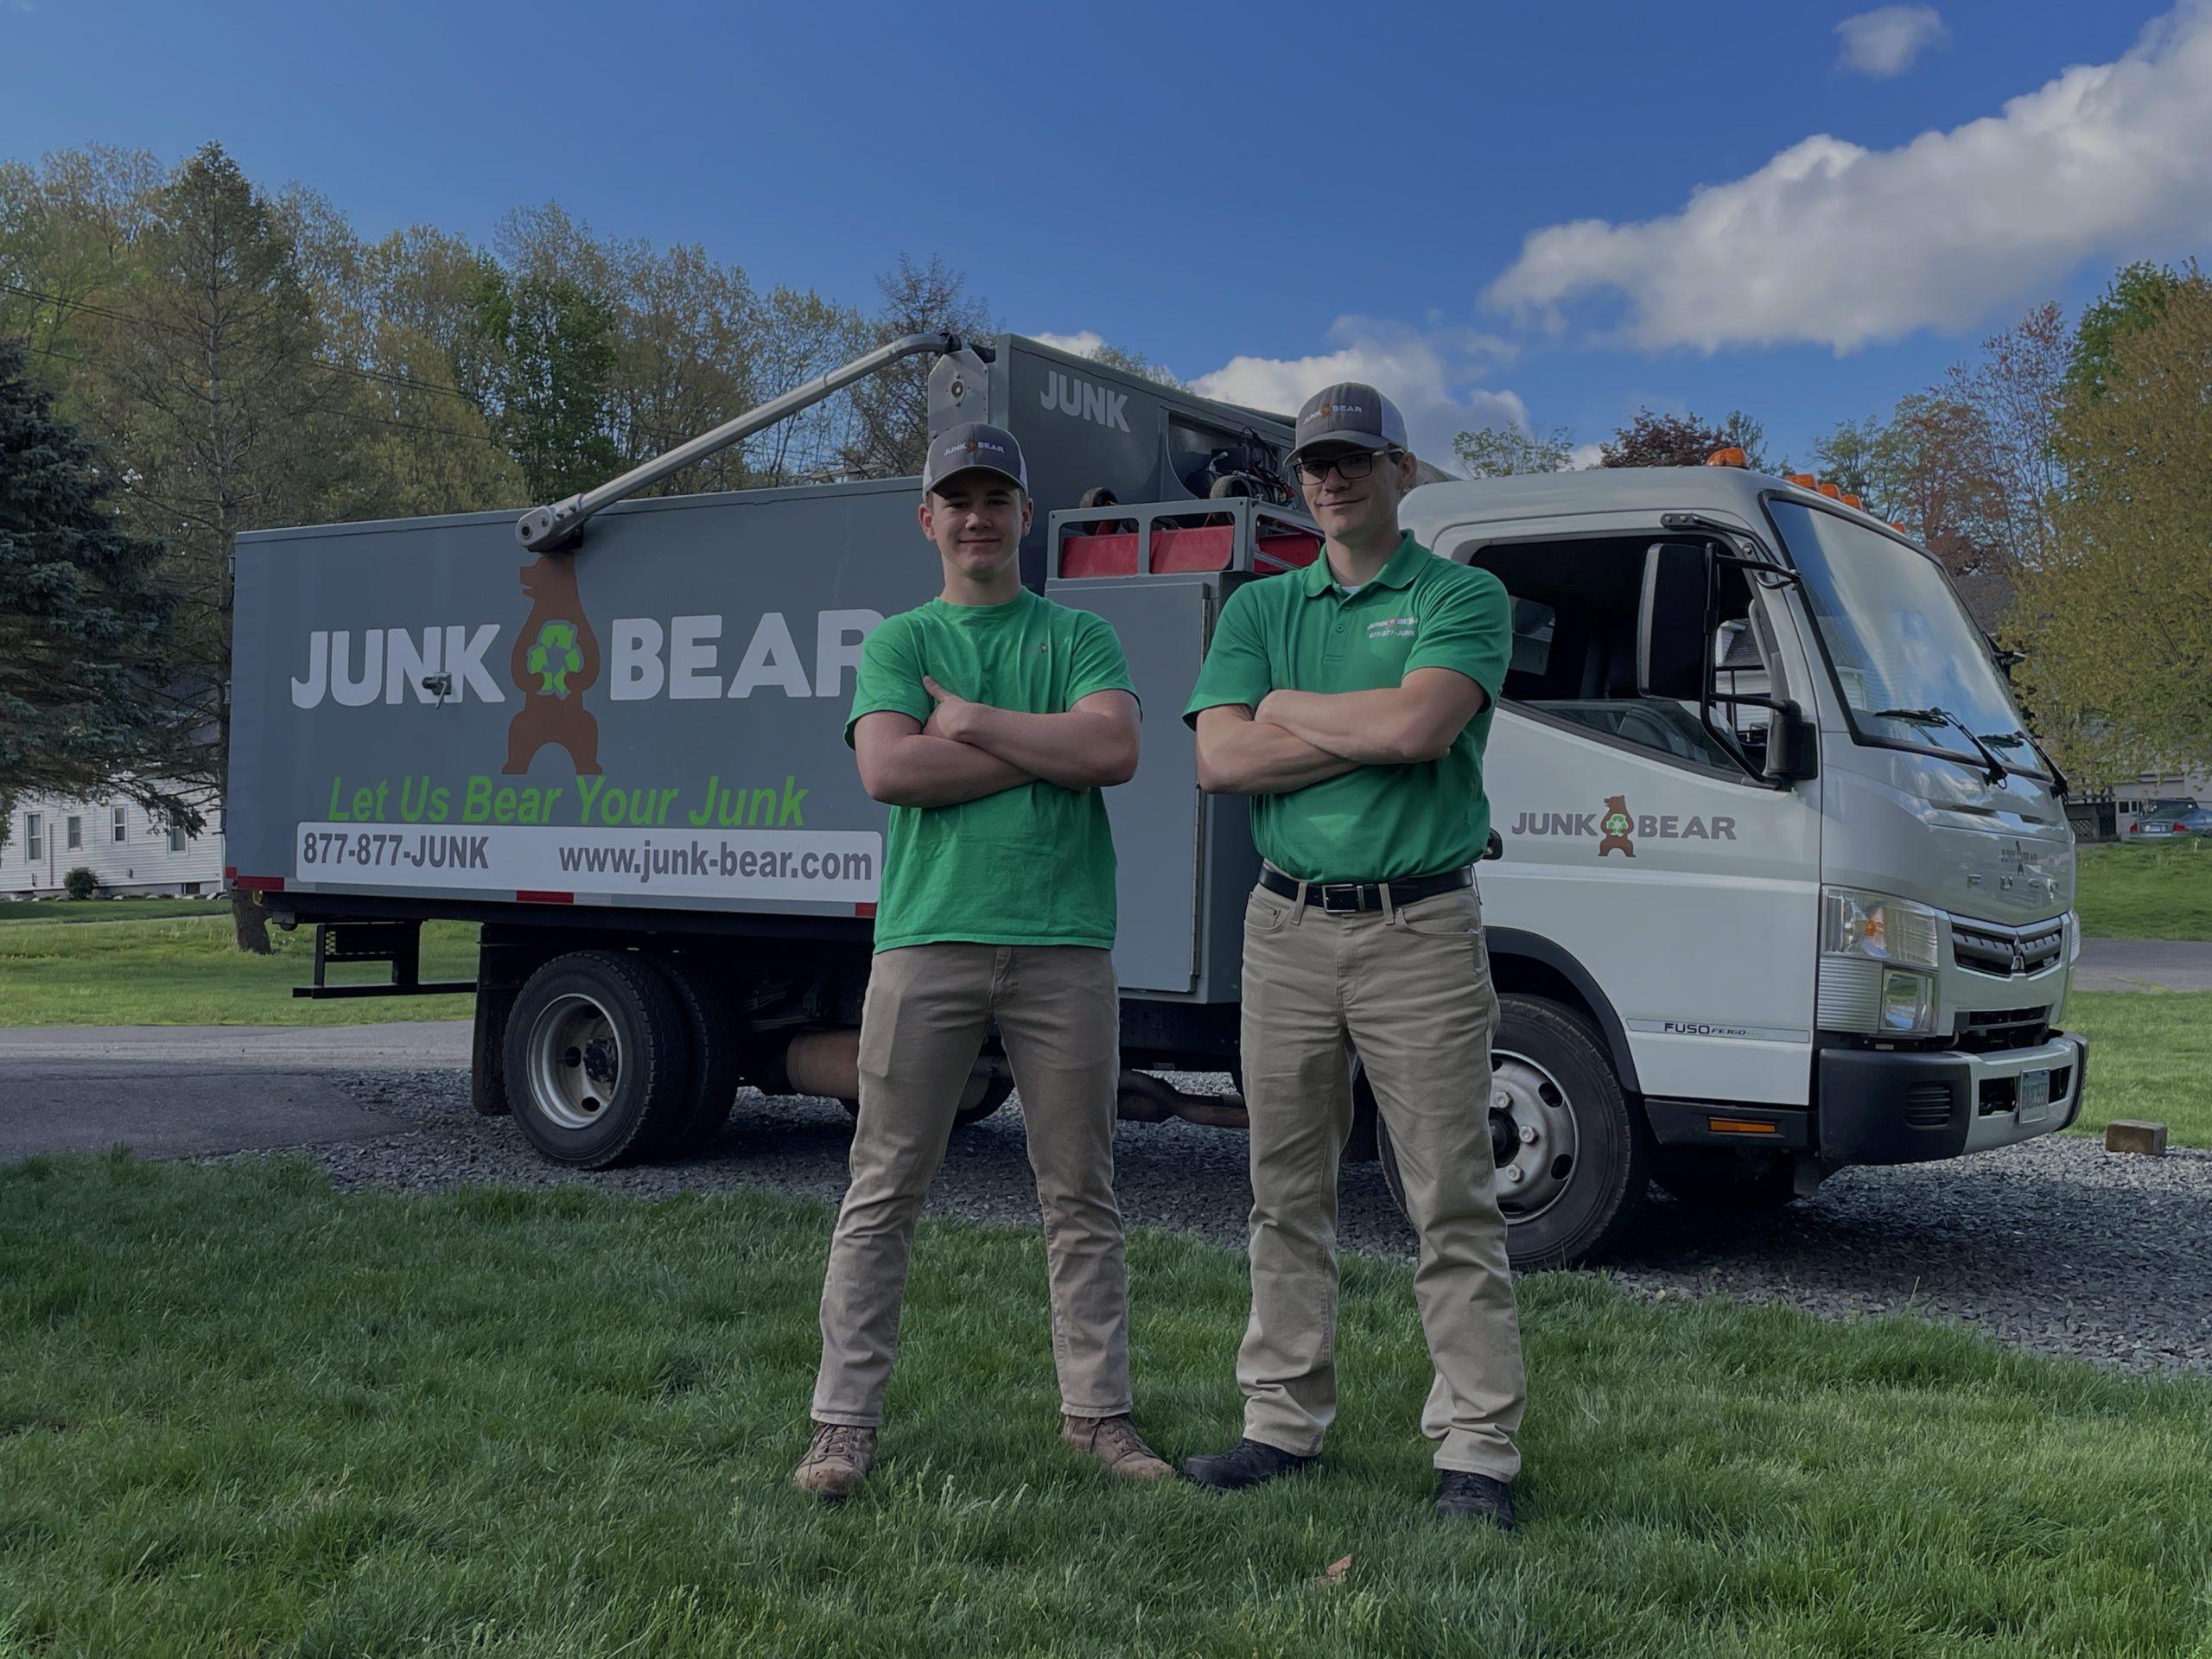 Junk Bear team members smiling in front of junk trunk